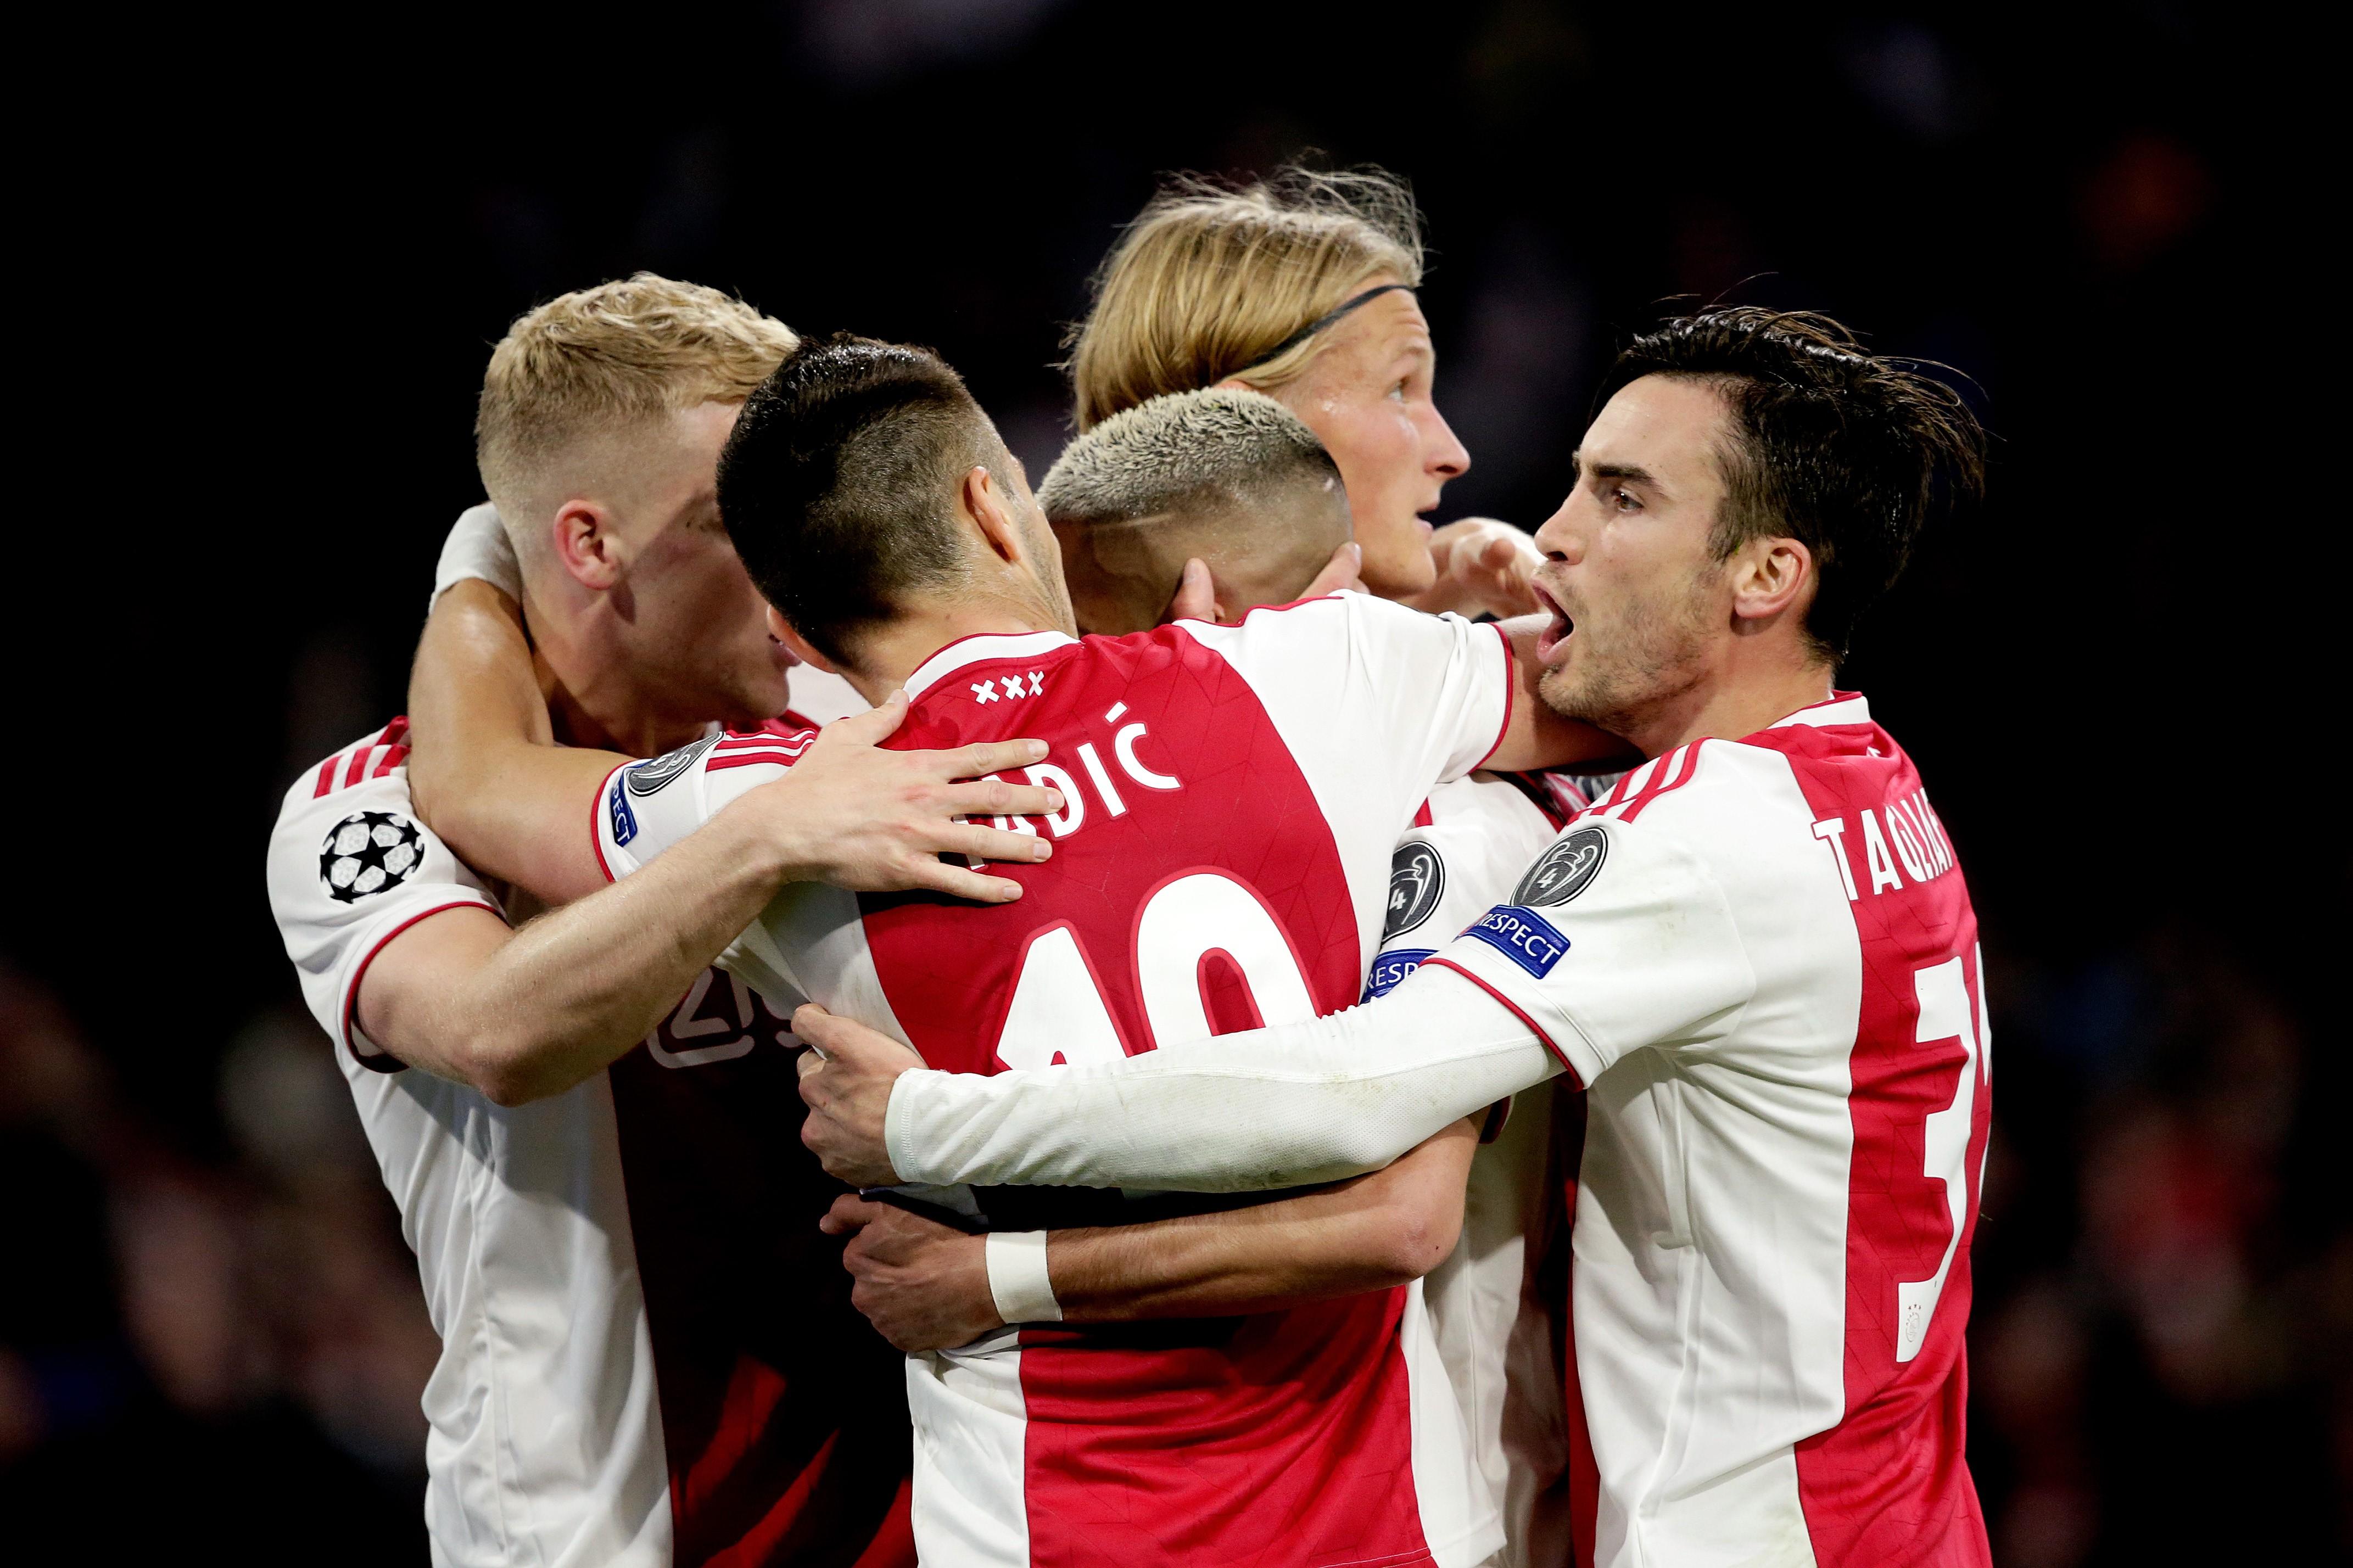 Donny van de Beek of Ajax, Dusan Tadic of Ajax, Hakim Ziyech of Ajax, Kasper Dolberg of Ajax, Nicolas Tagliafico of Ajax celebrate 2-0 during the UEFA Champions League match between Ajax v Tottenham Hotspur at the Johan Cruijff Arena on May 8, 2019 in Ams